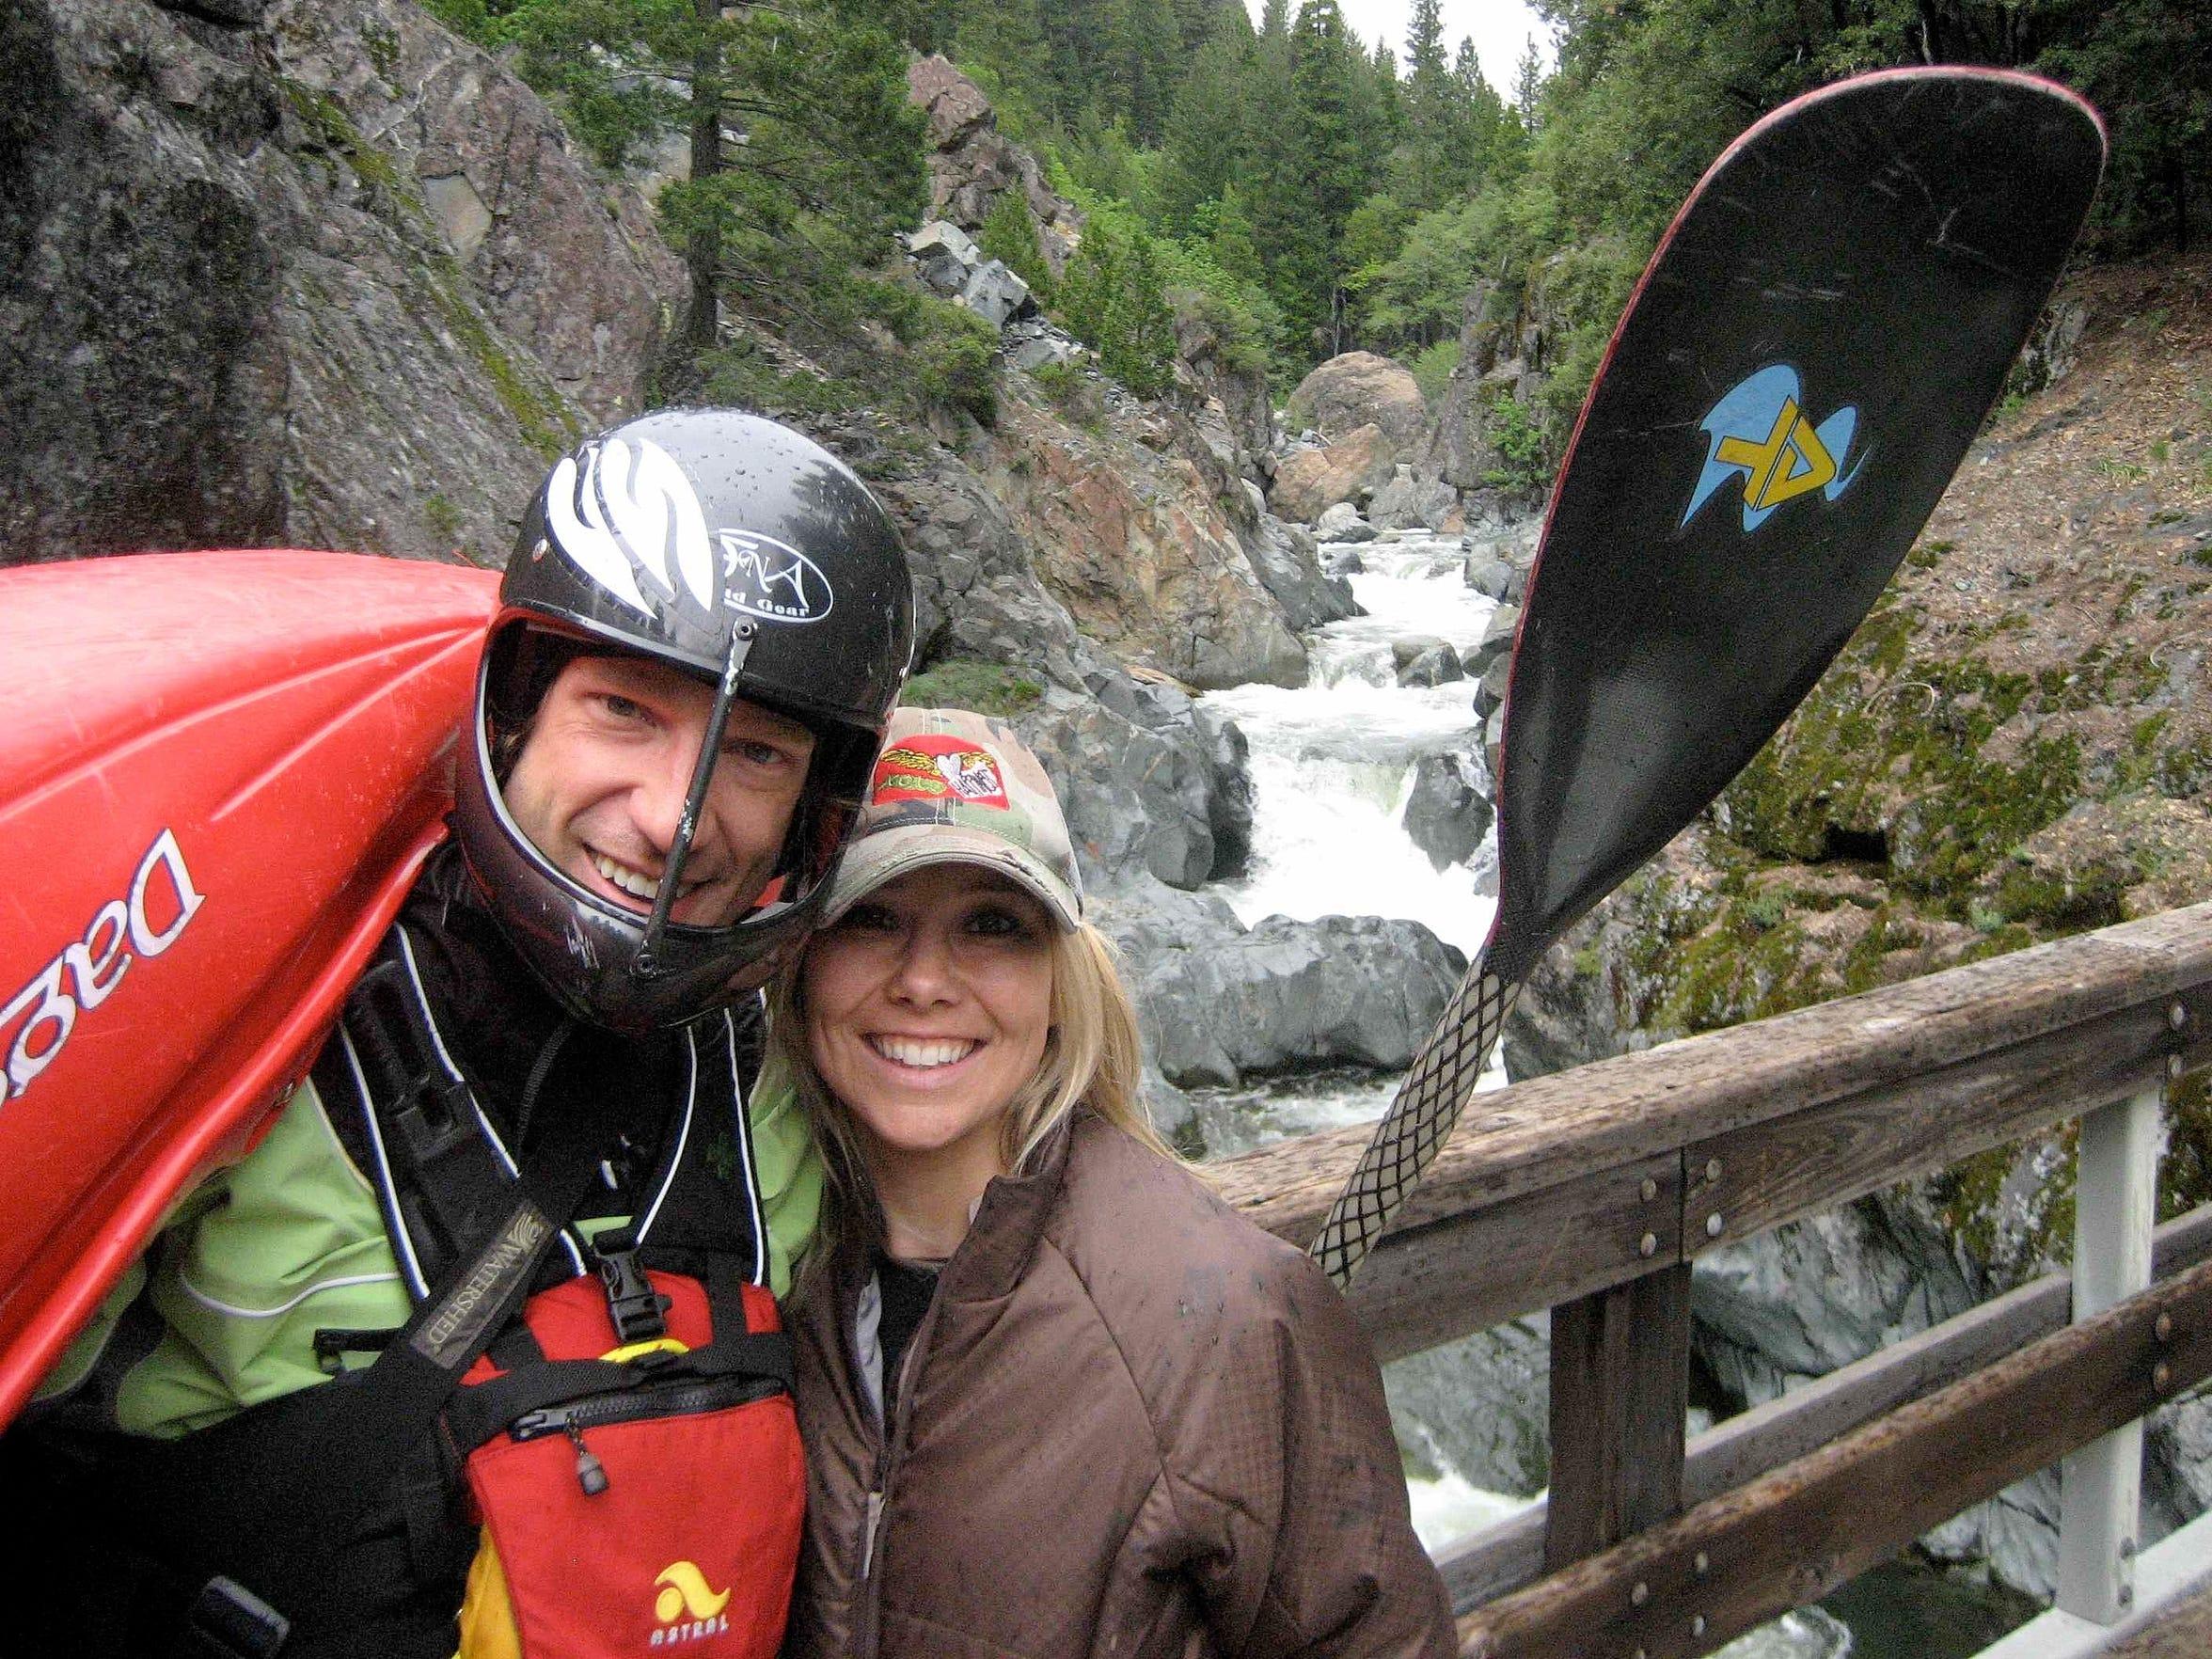 Grant and Shawna Korgan